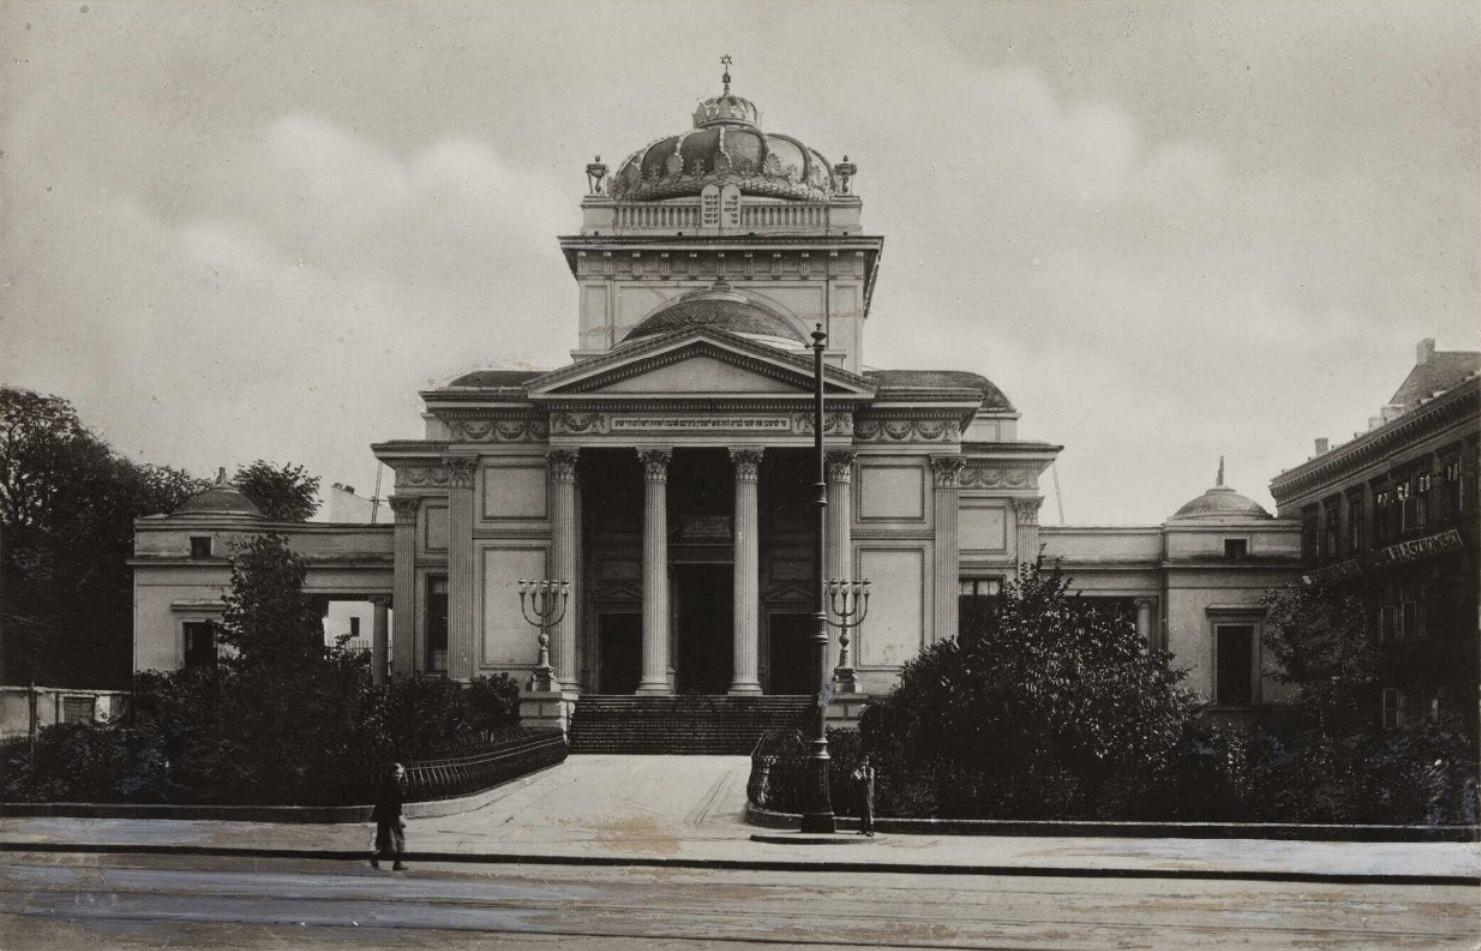 wielka_synagoga_berlinka.jpg [318.53 KB]